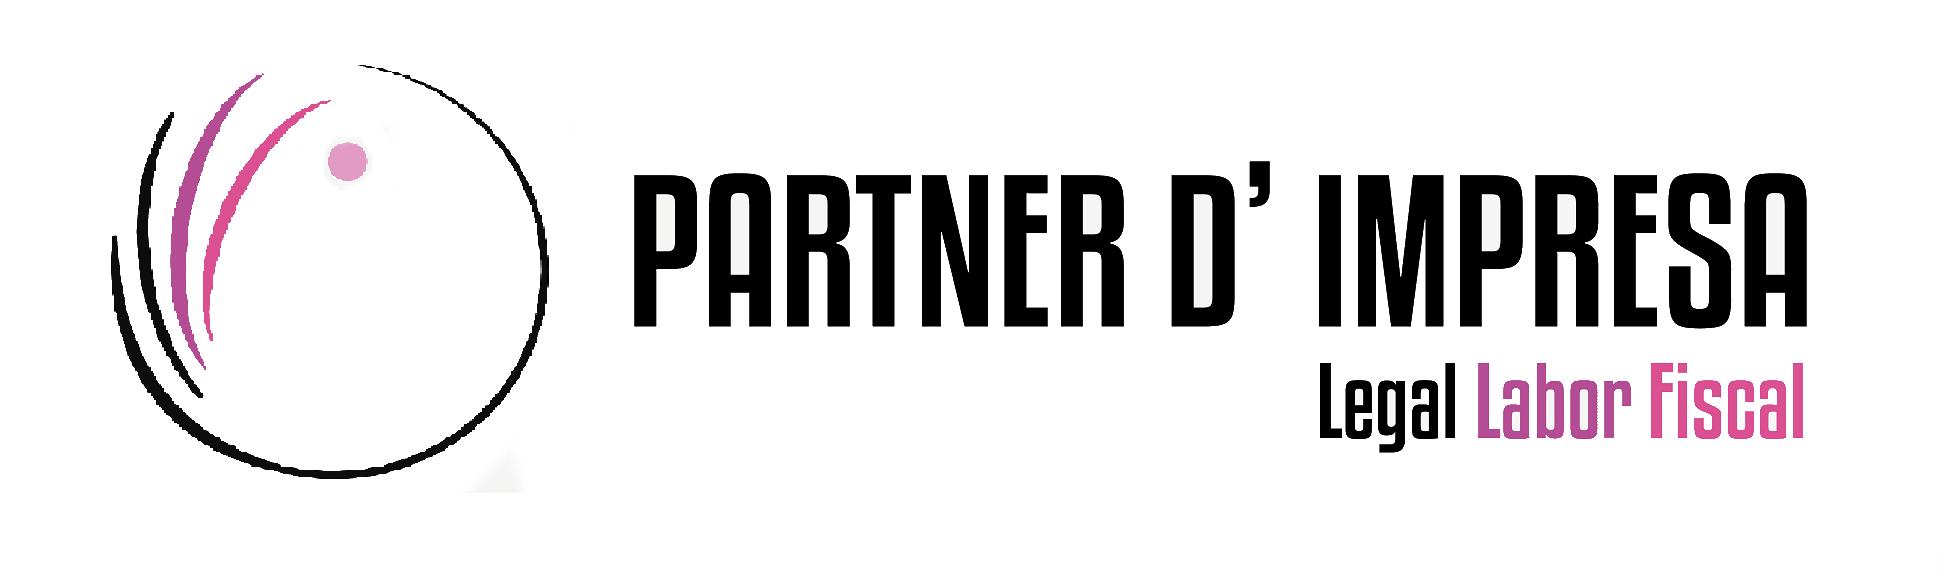 Partner d'Impresa